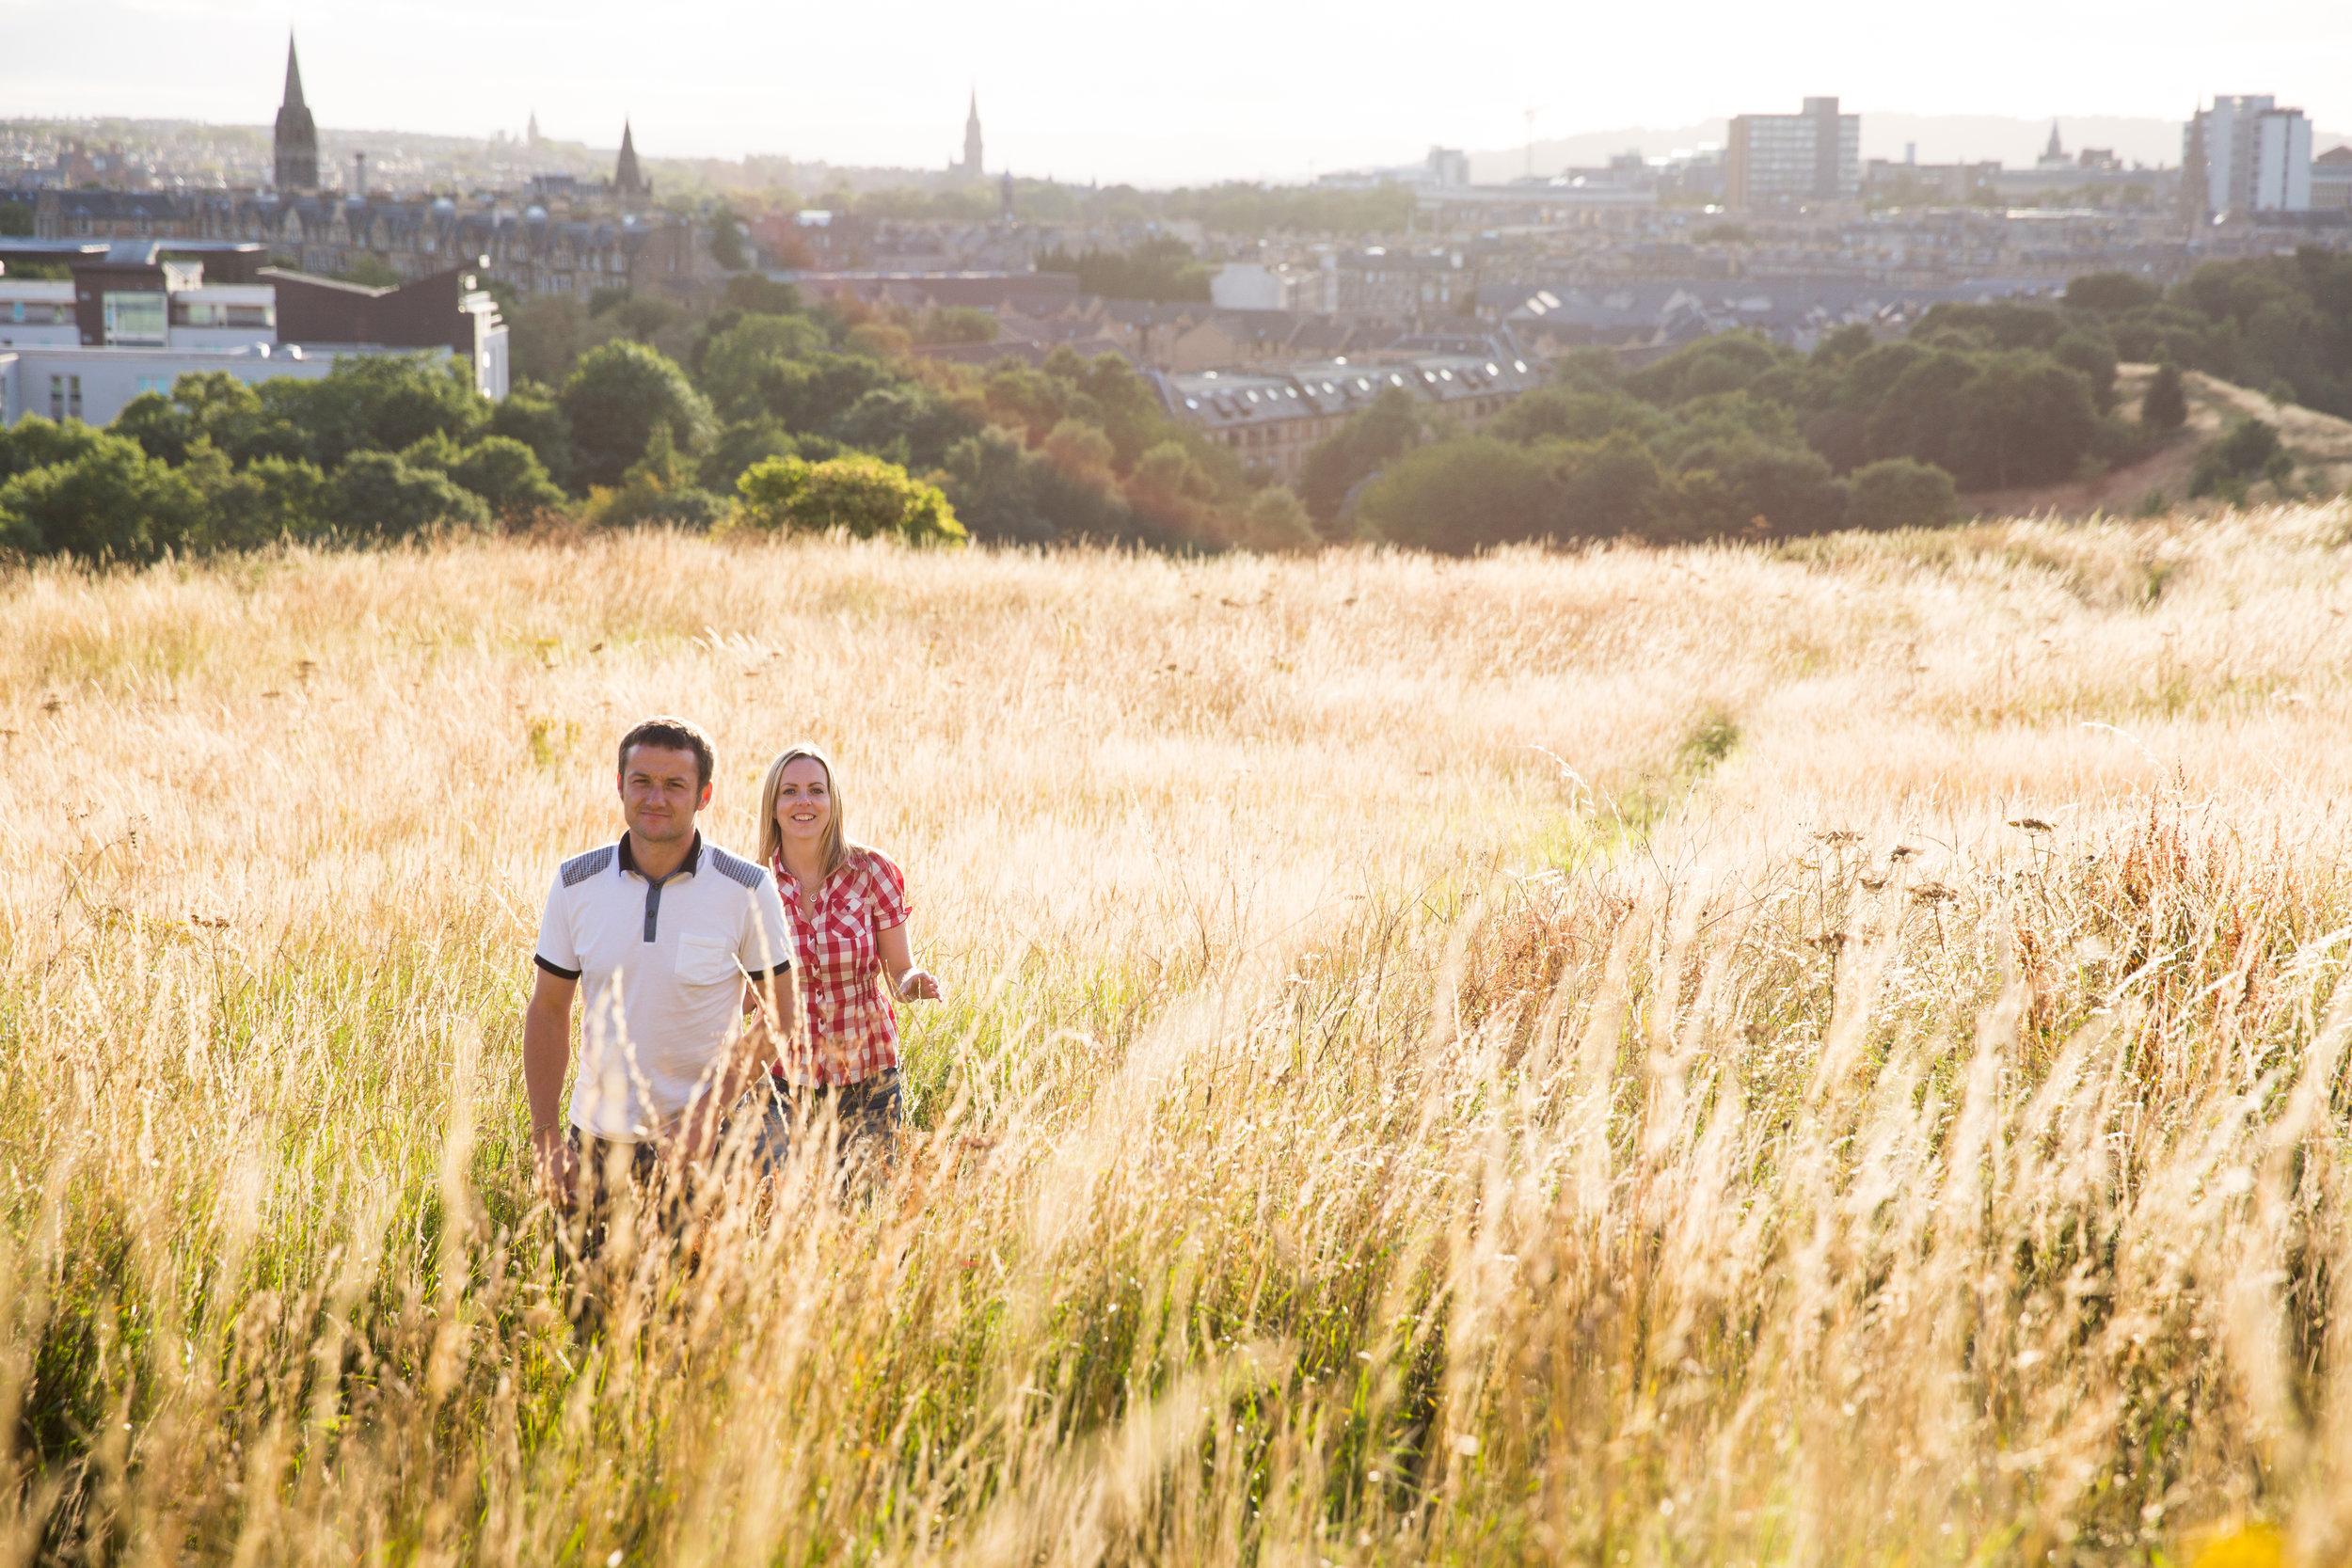 Jill-and-Gavin-engagement-37.jpg